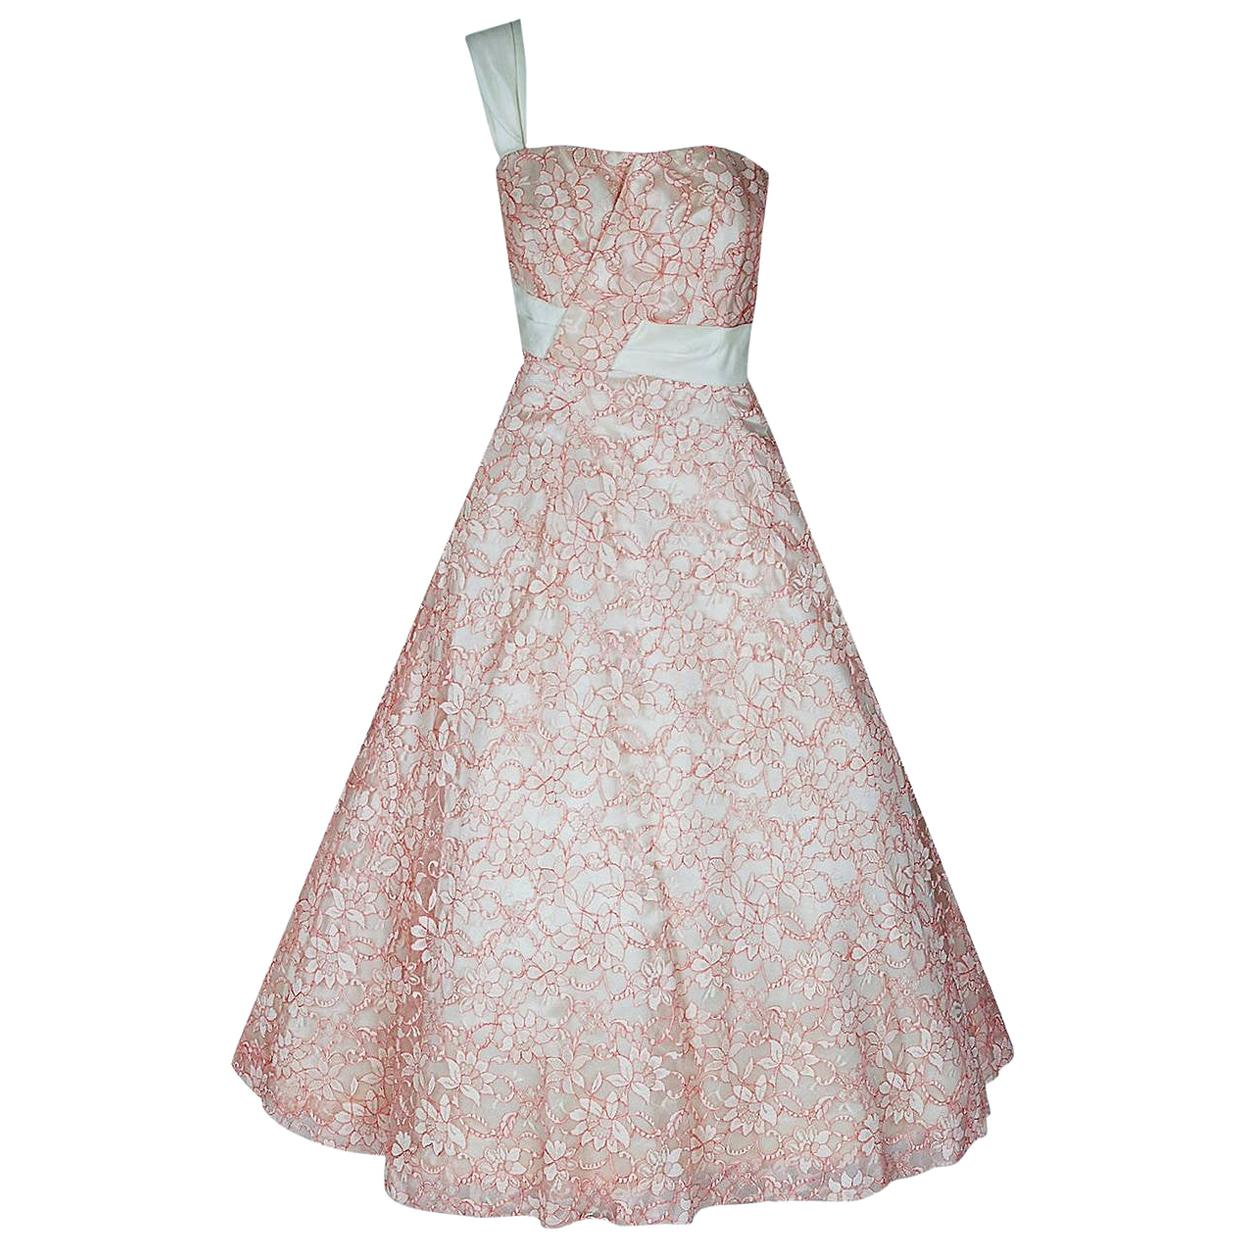 Vintage 1950's Jacques Heim Haute Couture Pink & White Lace One-Shoulder Dress